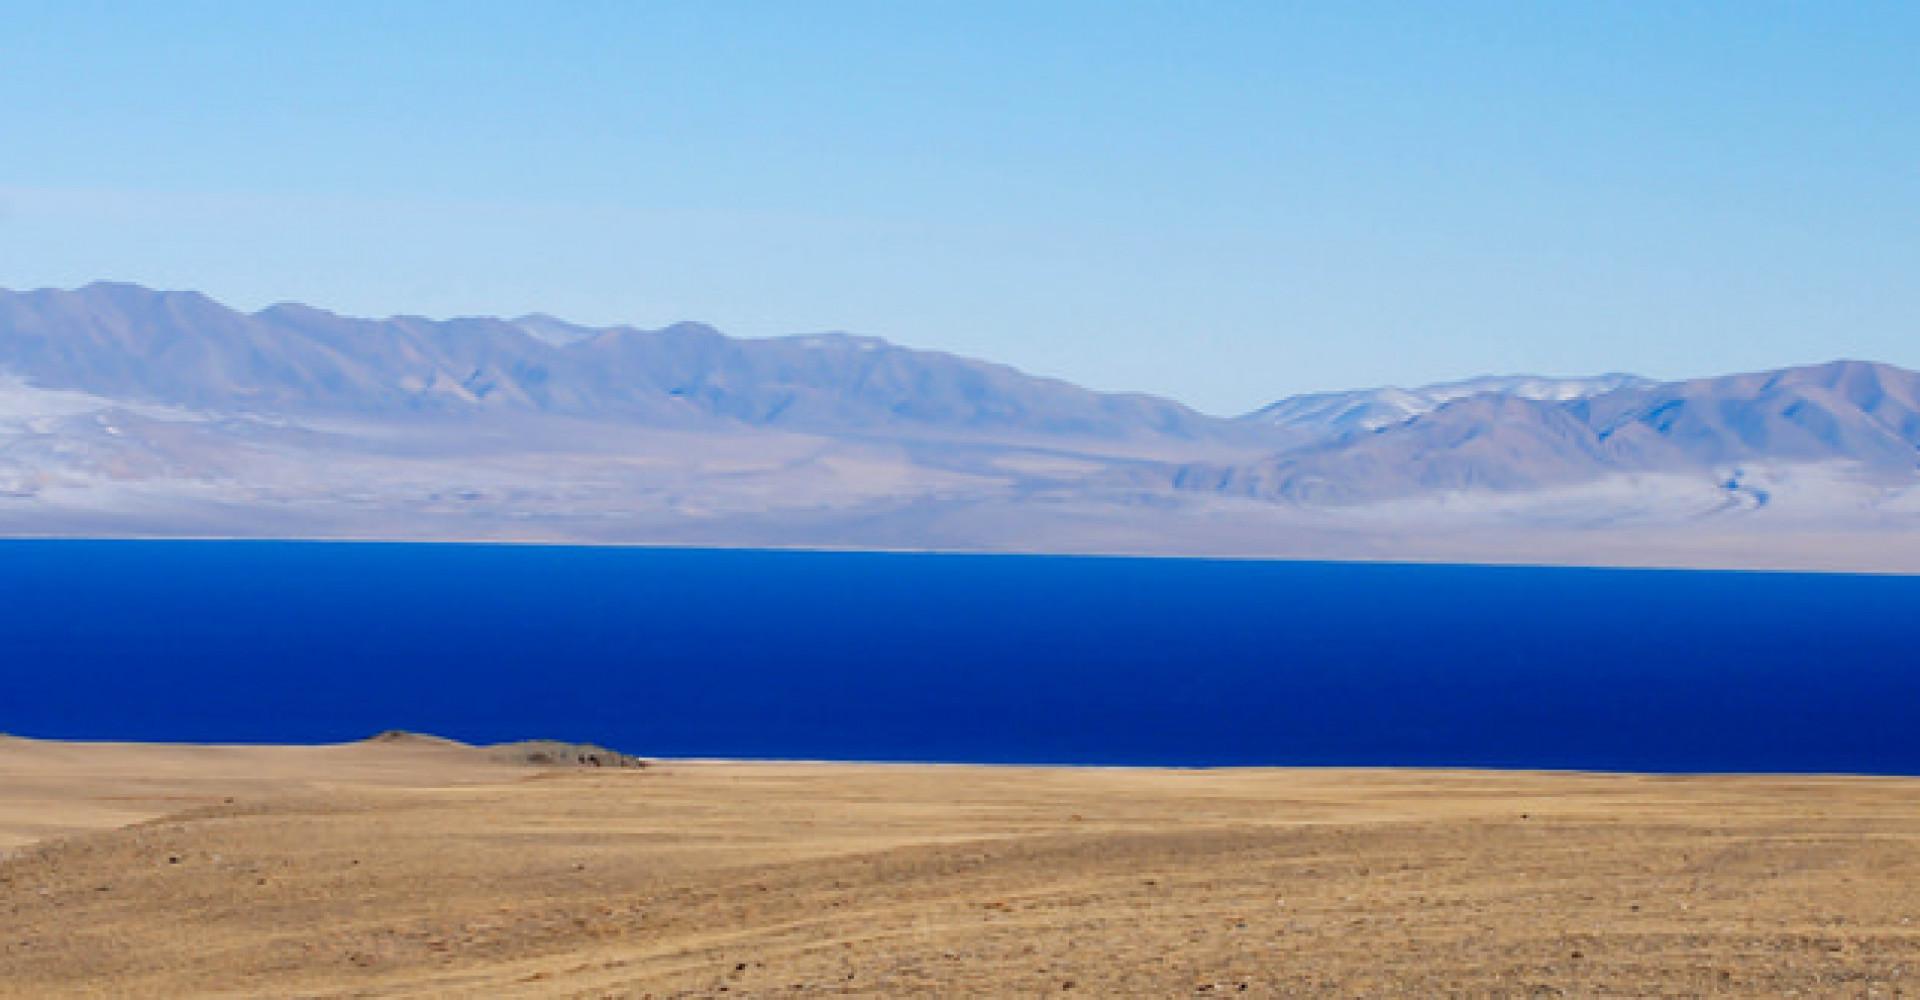 Uureg lake